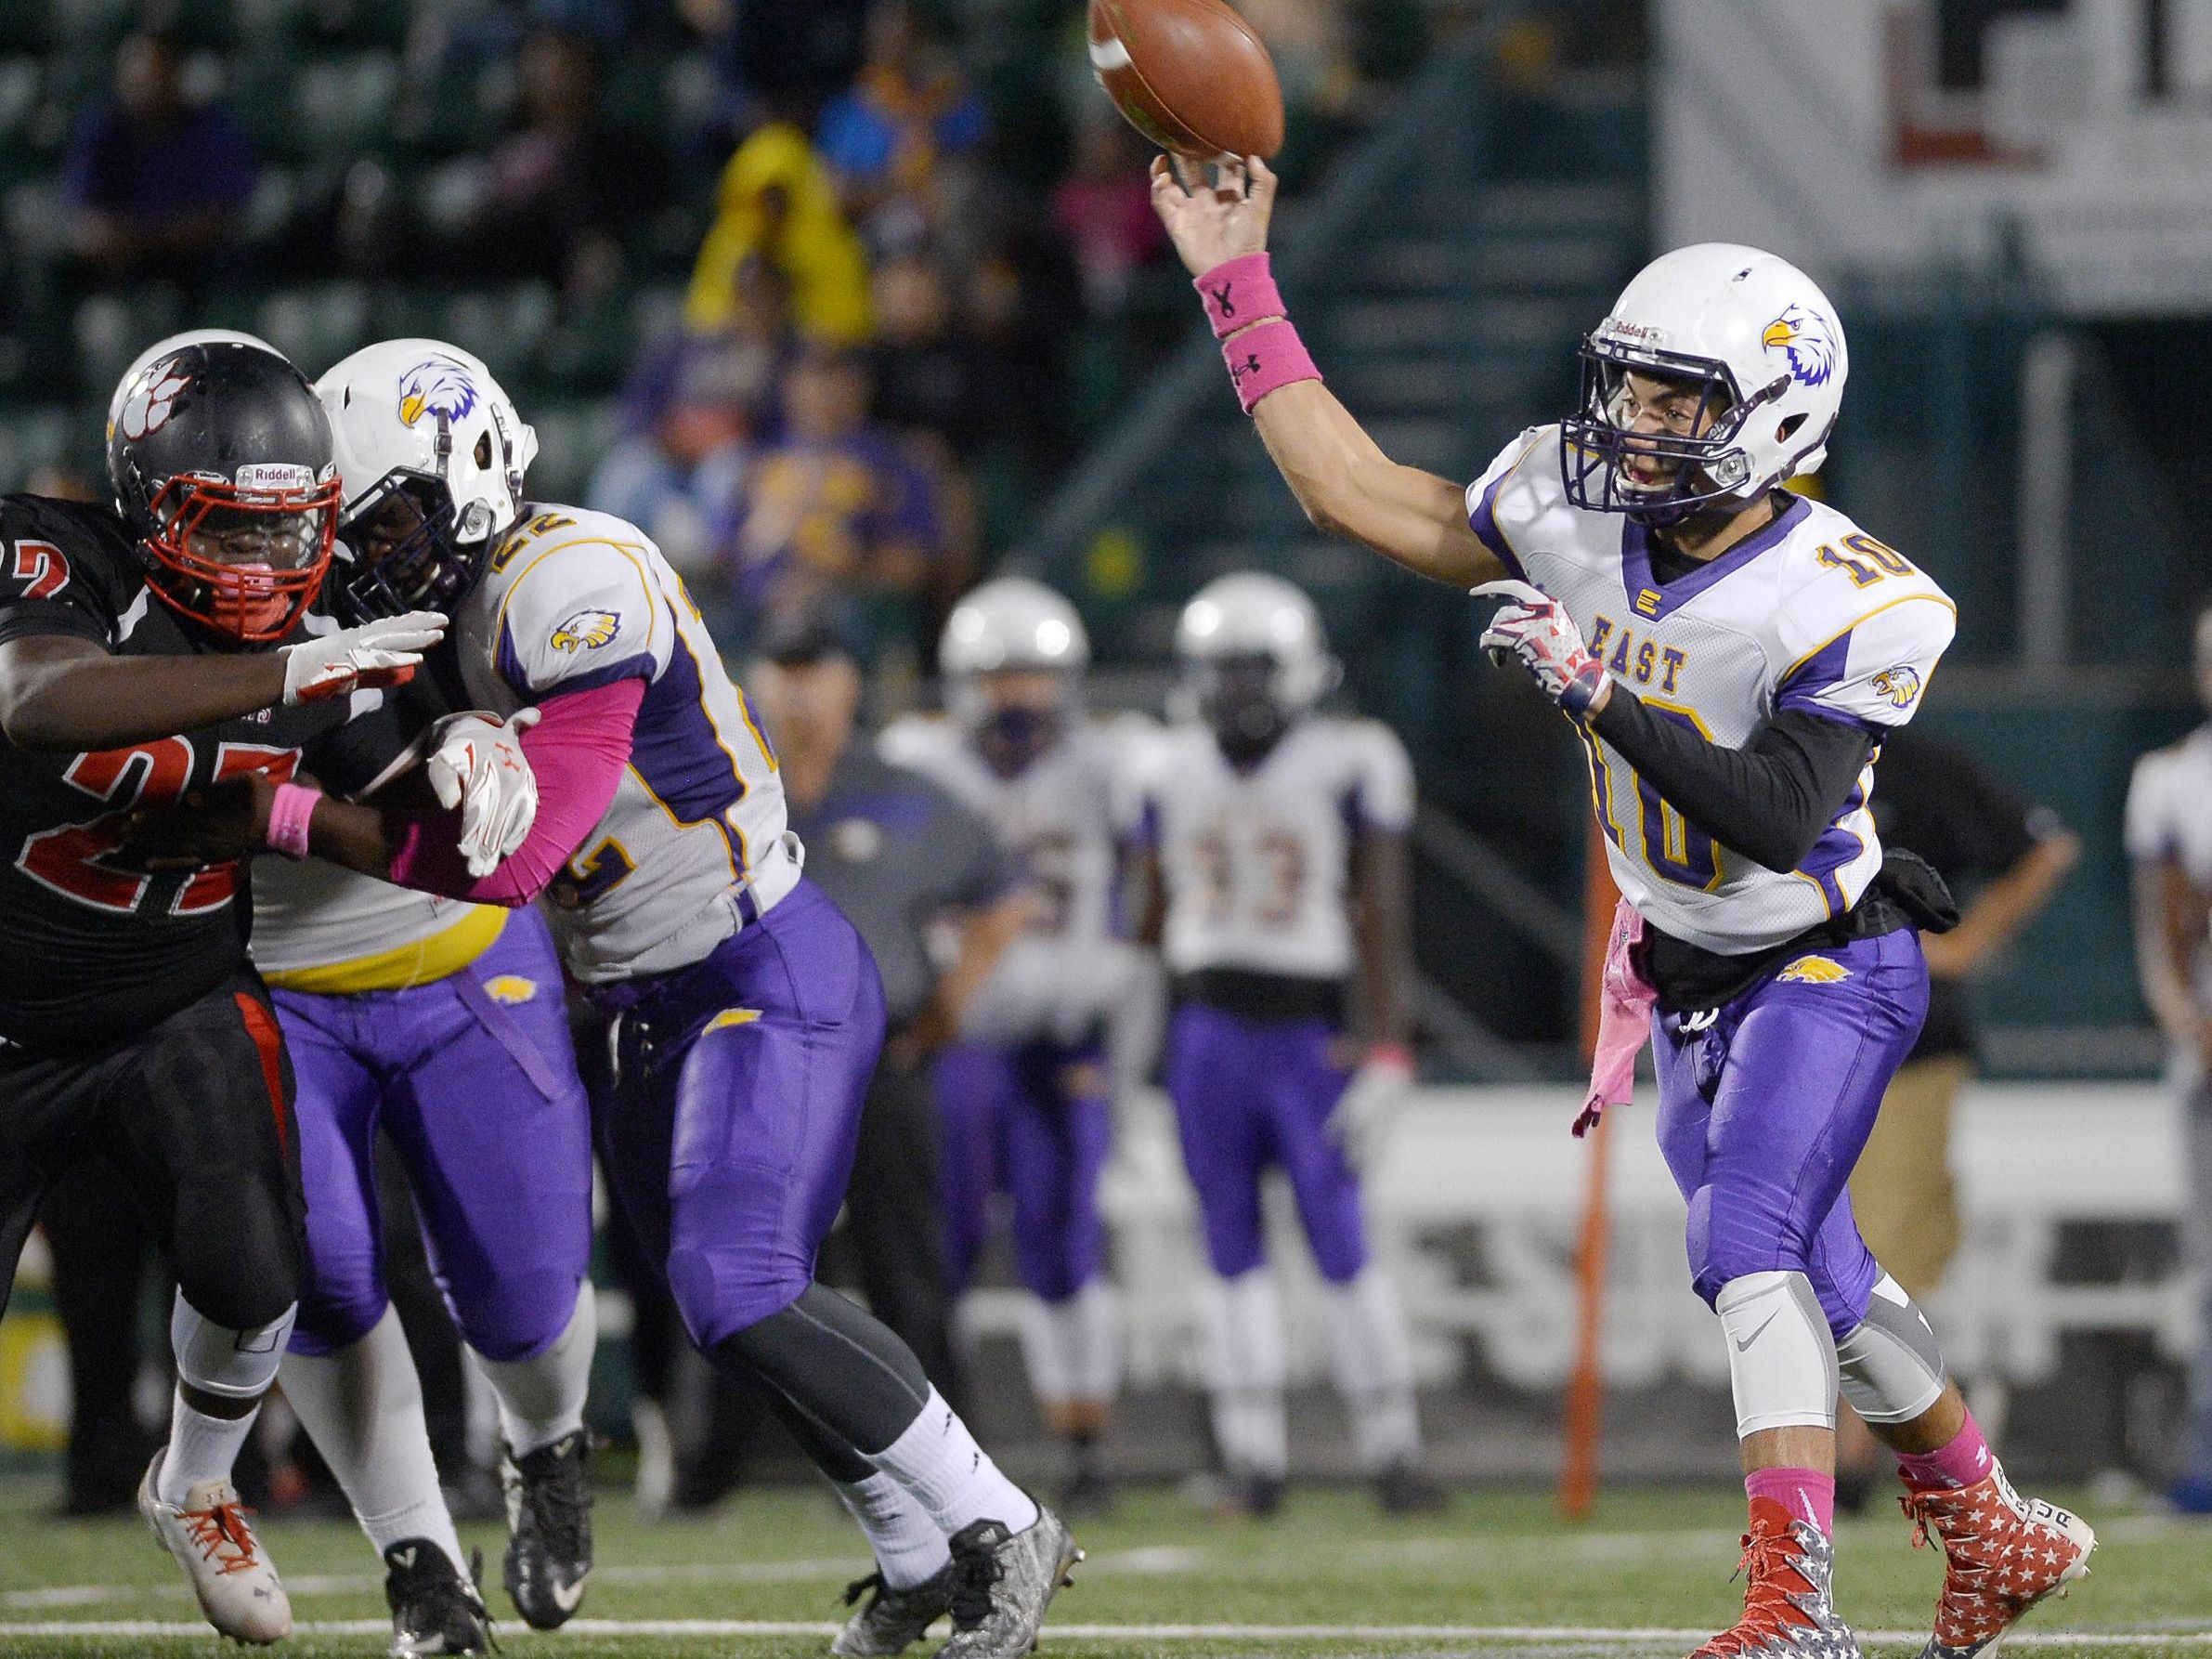 East quarterback Sam Sheldon throws from the pocket.